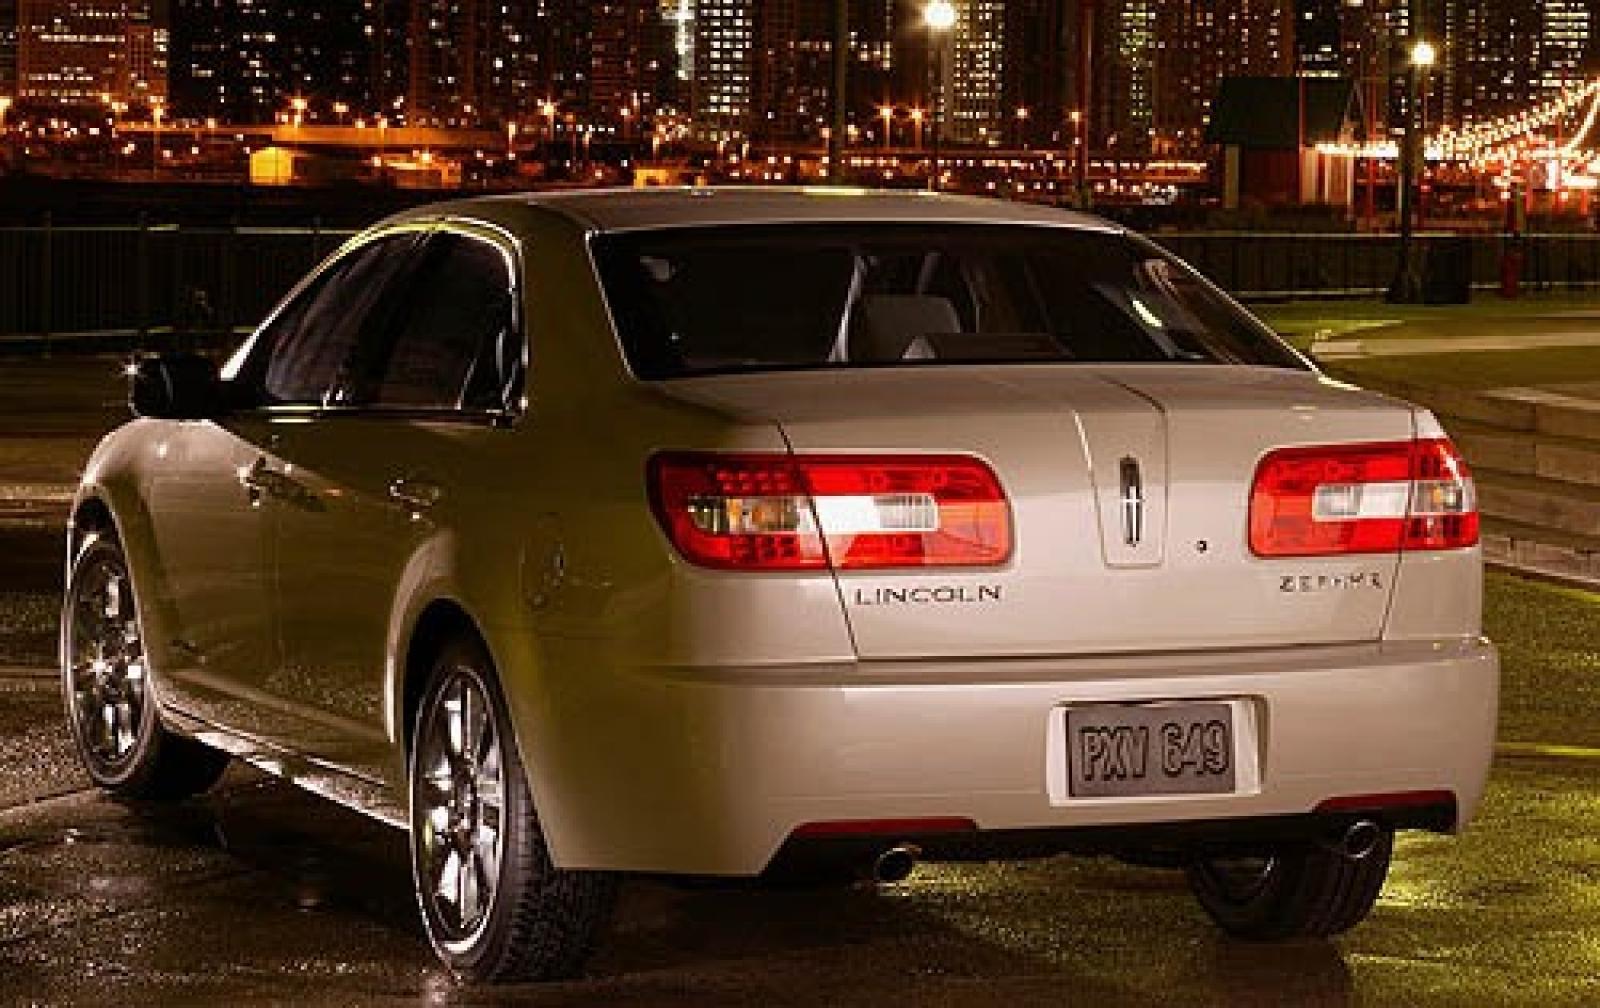 Lincoln MKZ I (Zephyr) 2006 - 2009 Sedan #1